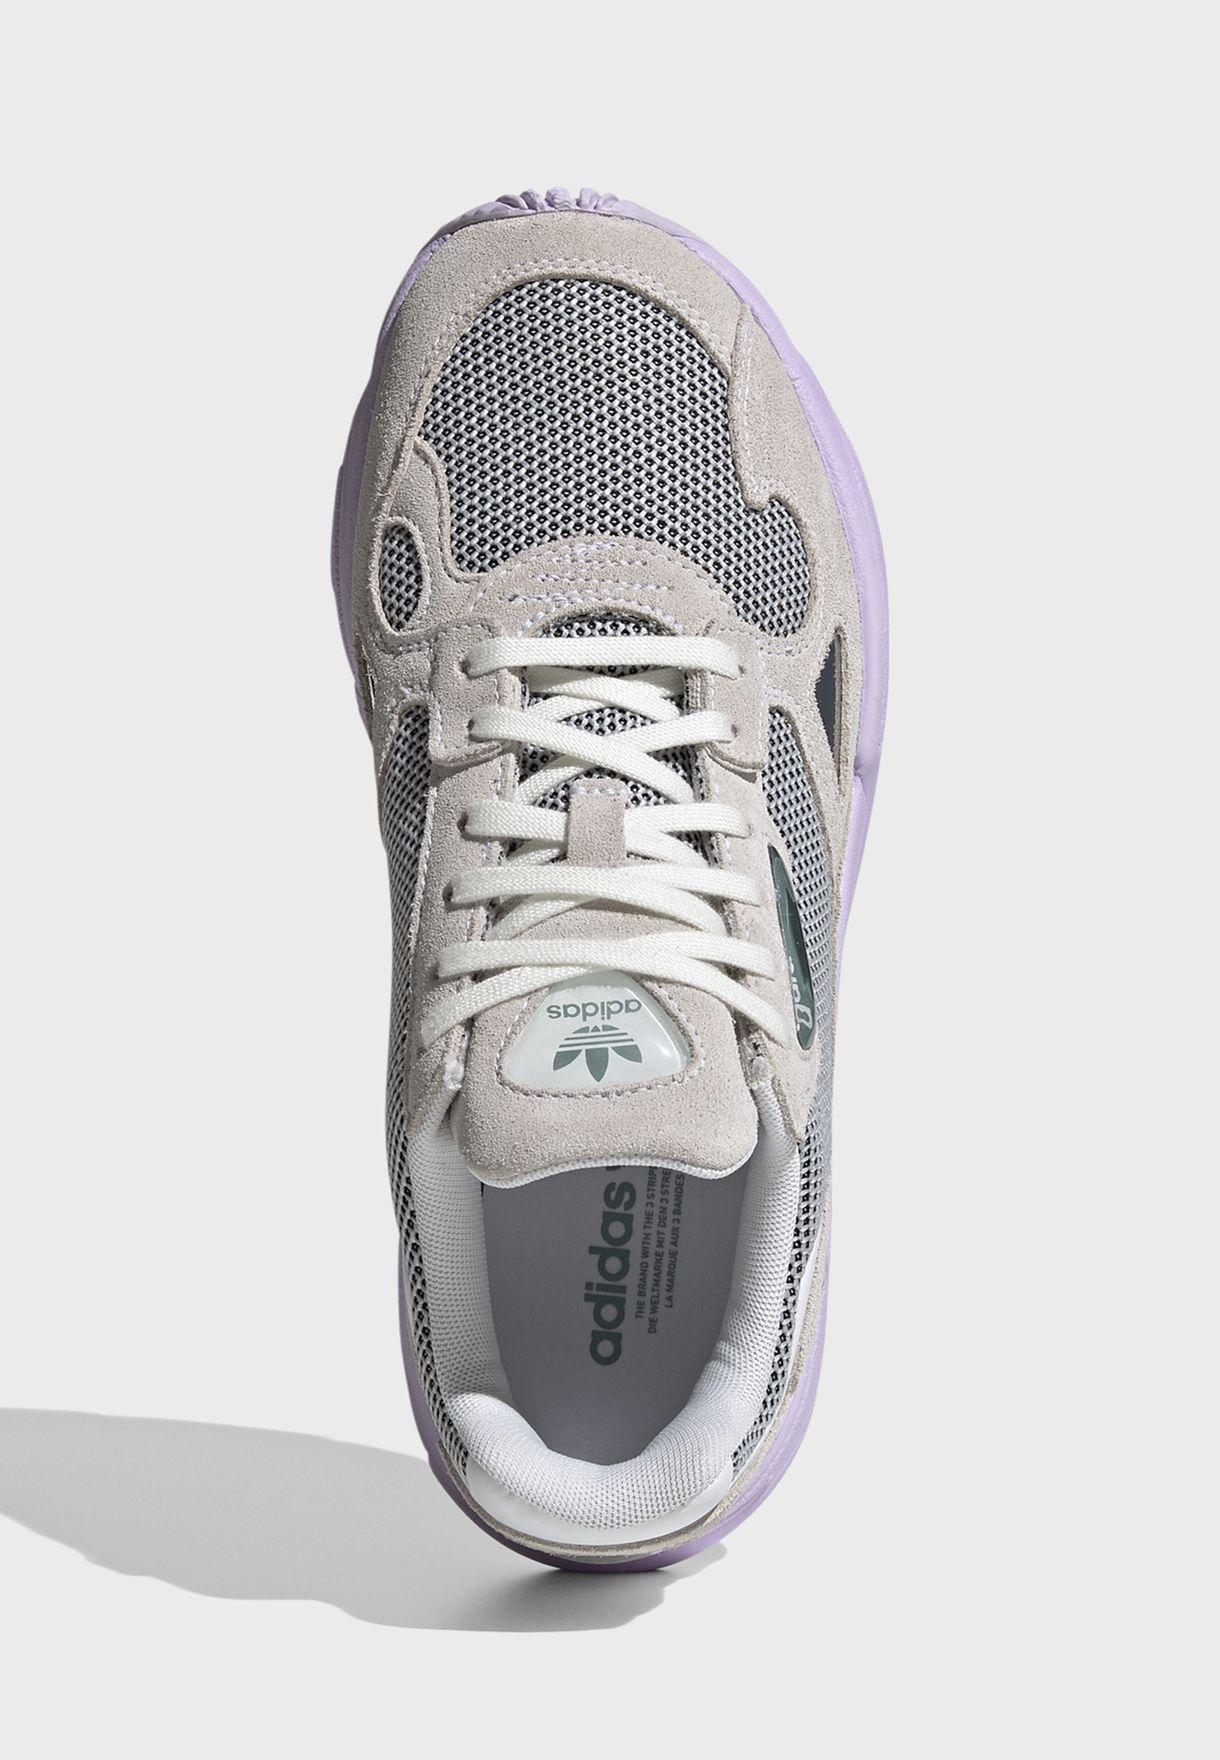 Falcon Casual Women's Sneakers Shoes